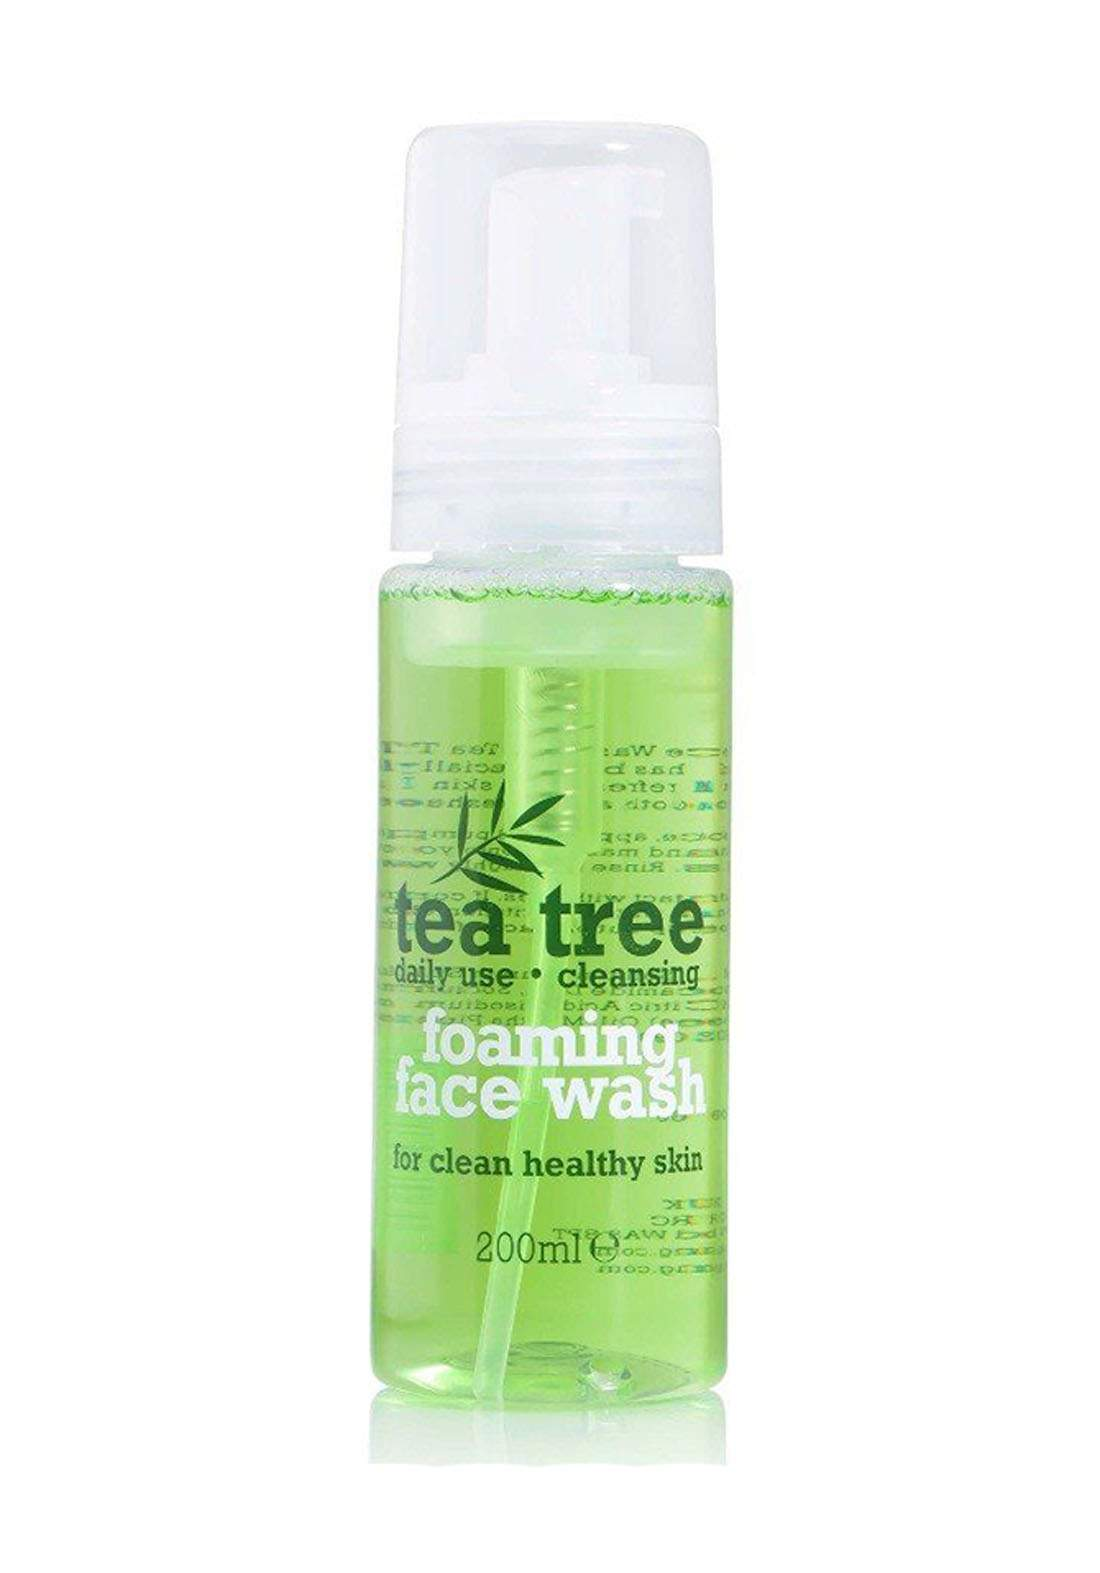 Tea Tree Foaming Face Wash - 200ml غسول للبشرة